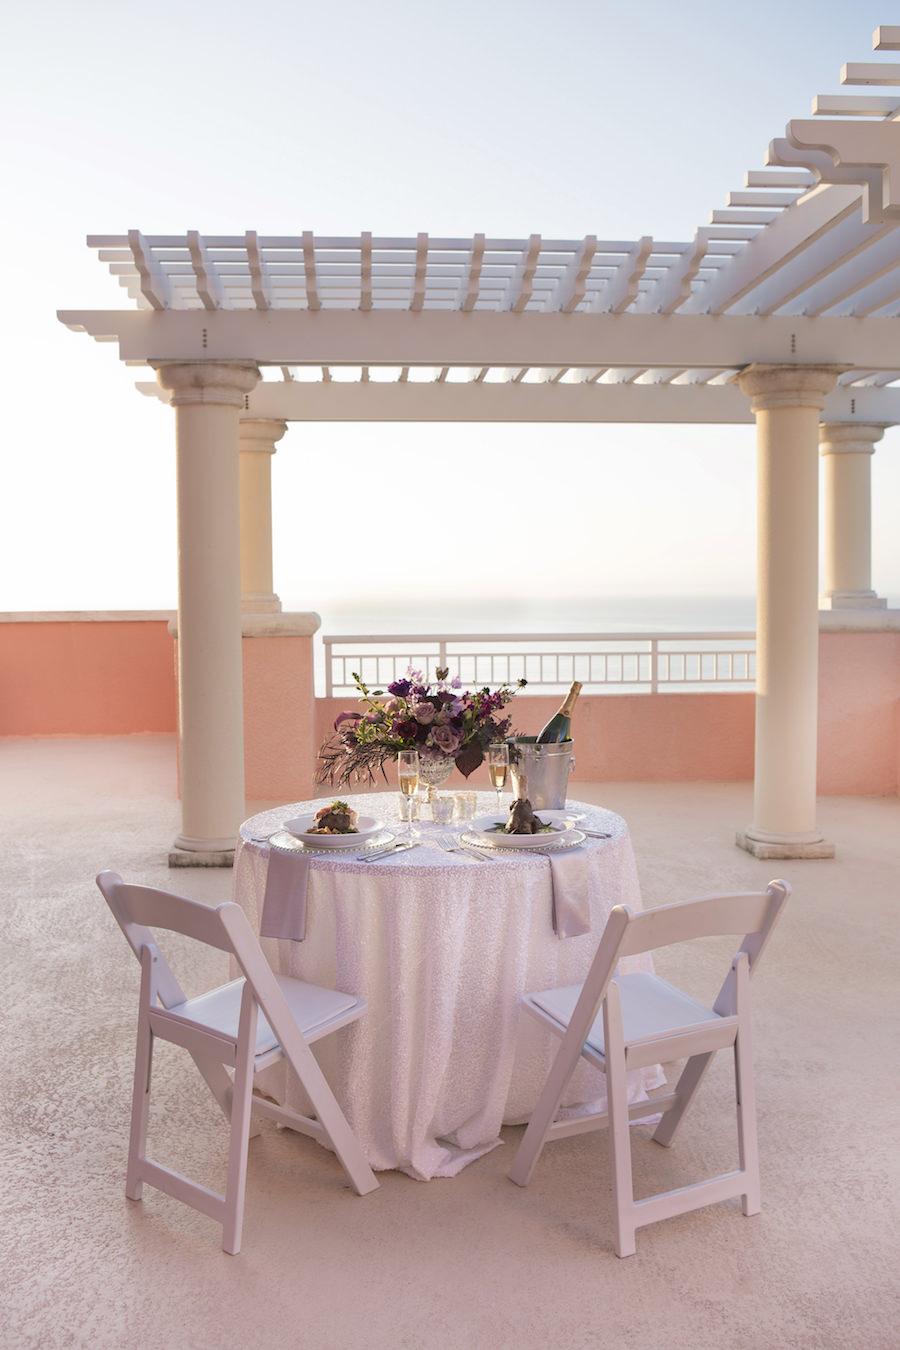 Intimate Engagement Proposal Dinner for Two | Clearwater Beach Wedding Venue Hyatt Regency